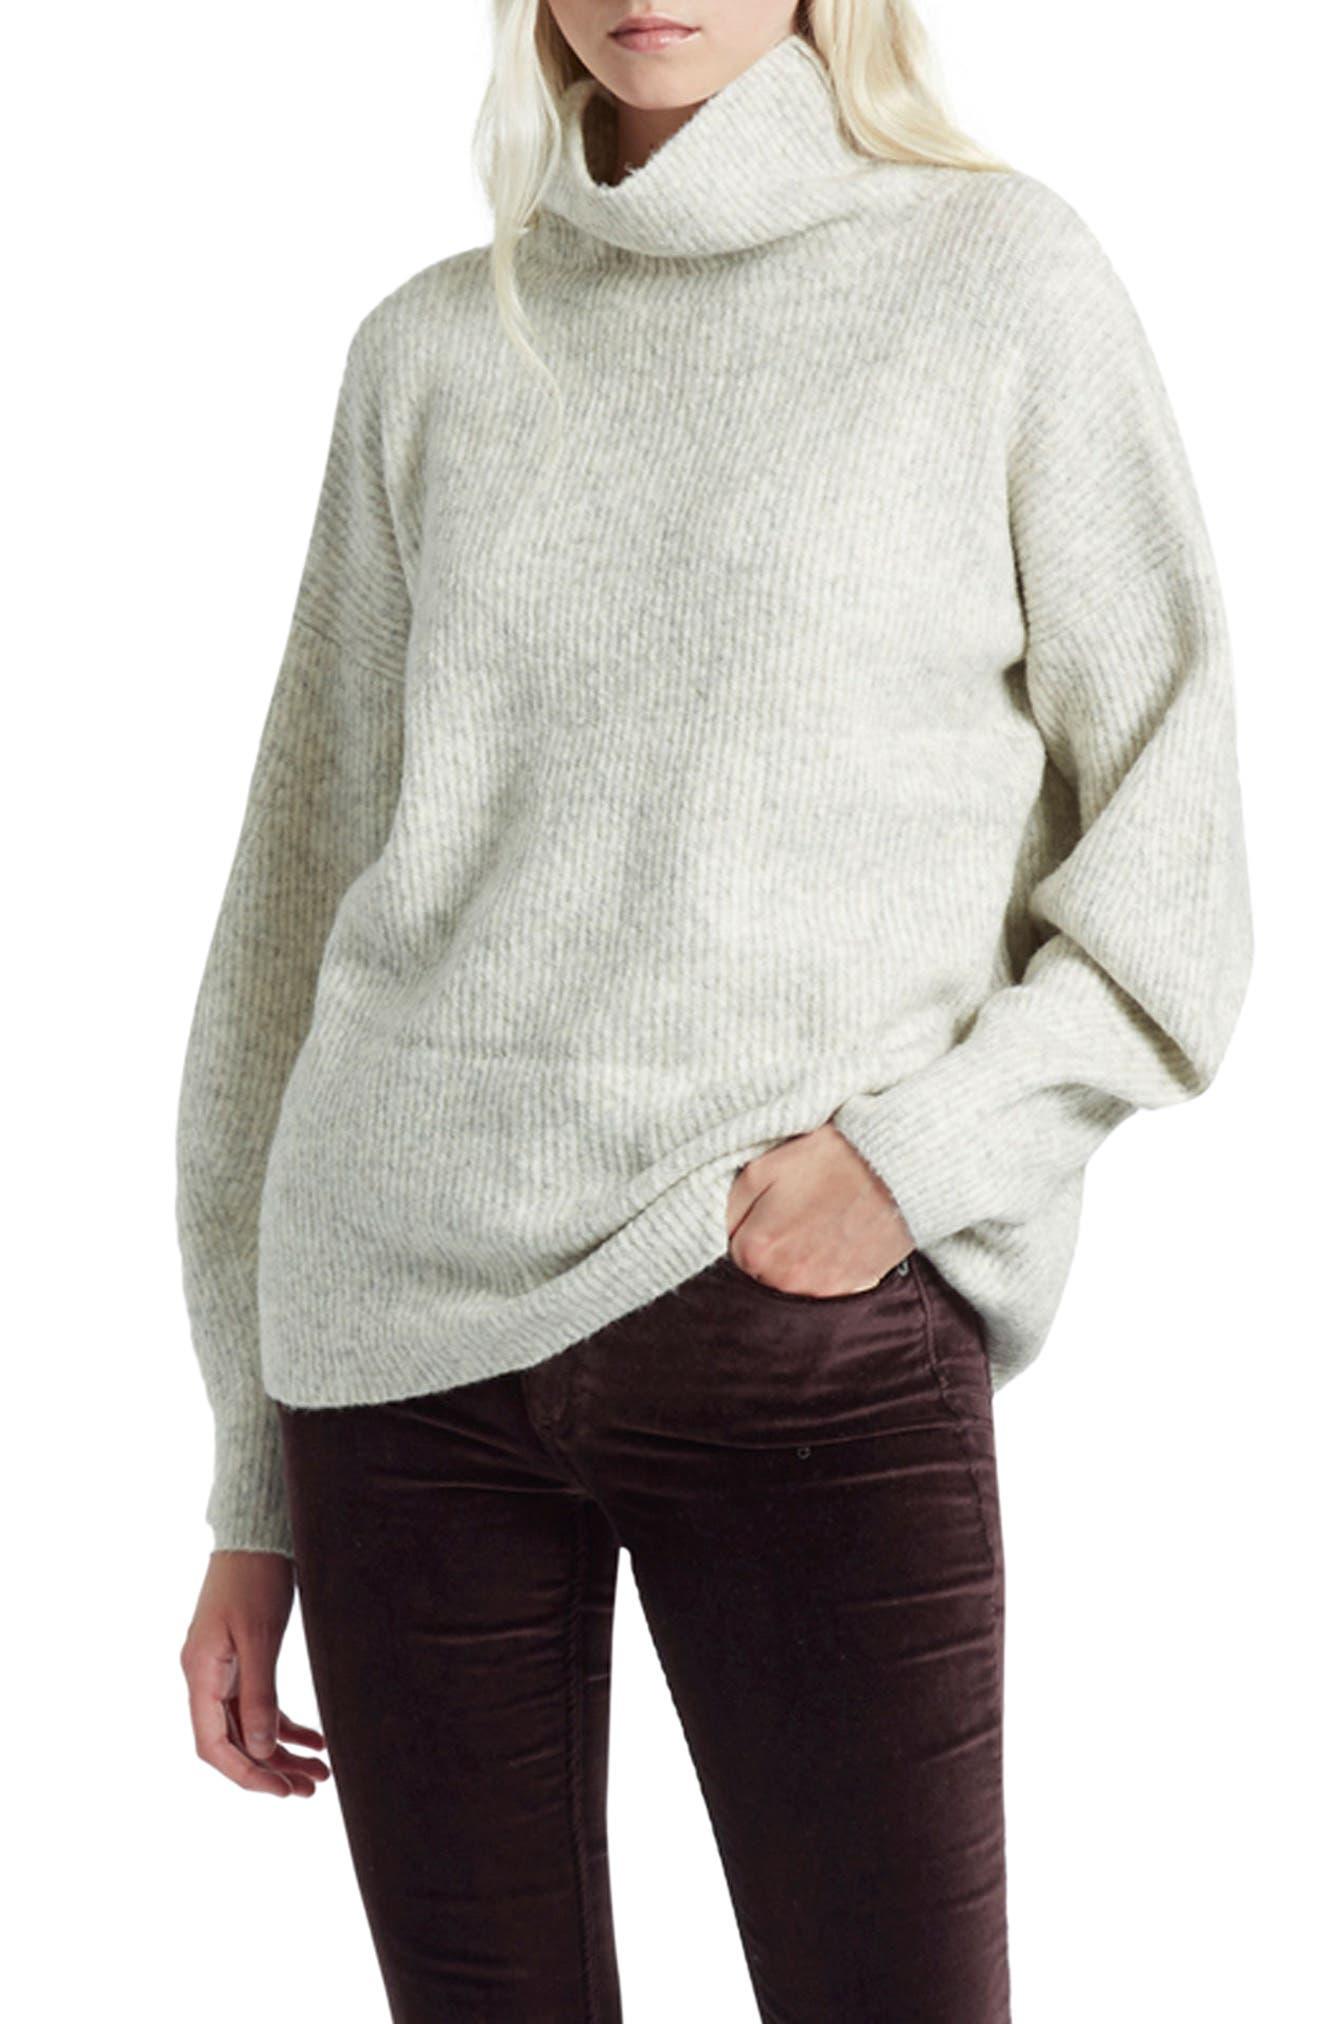 Urban Flossy Turtleneck Sweater,                         Main,                         color, Light Oatmeal